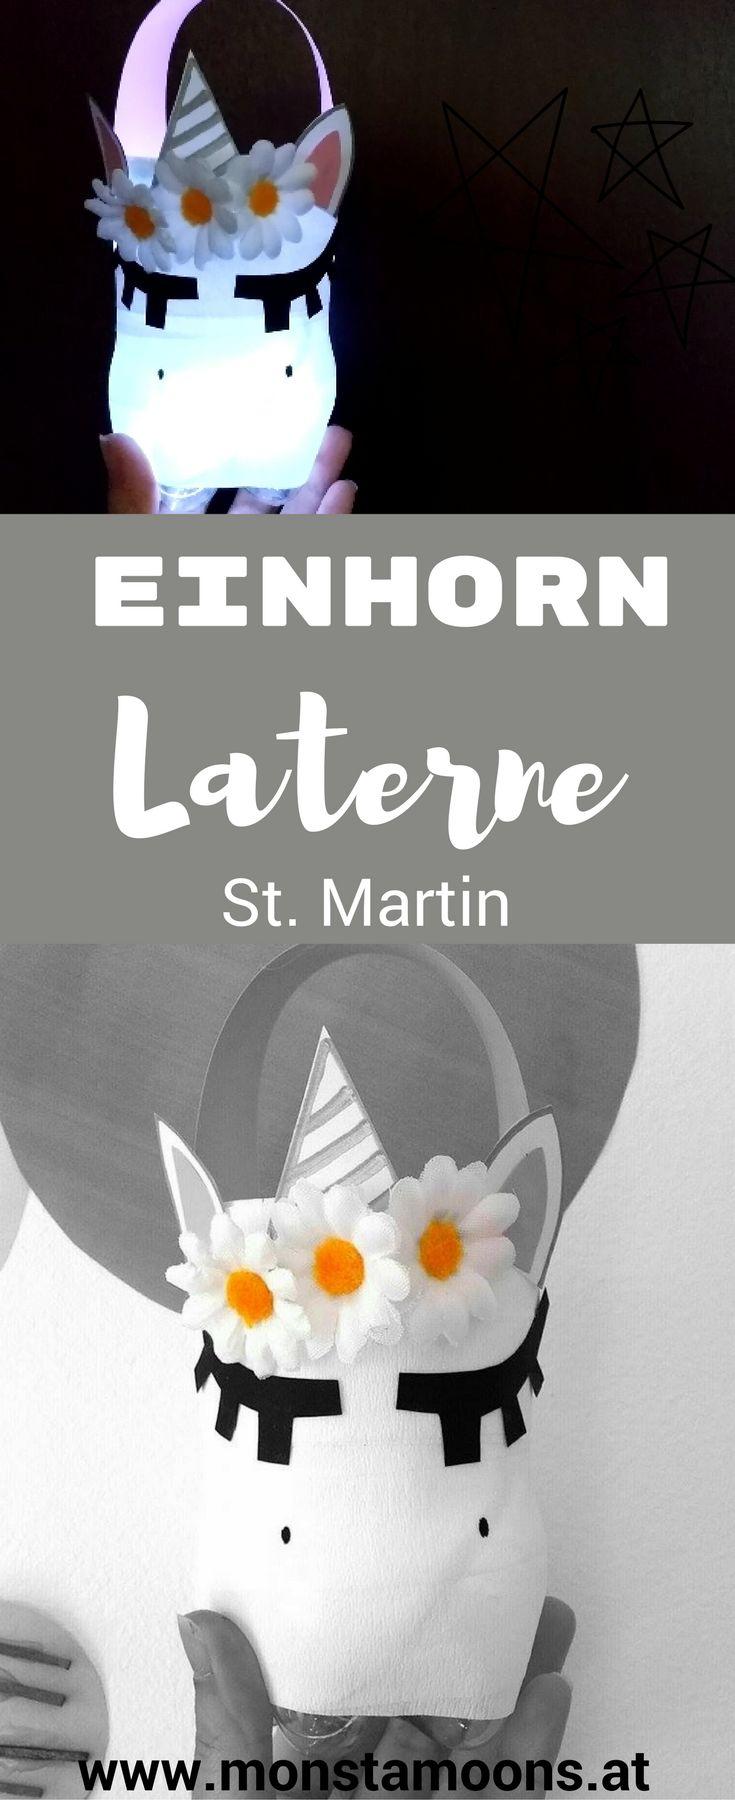 Einhorn Laterne basteln, Laterne basteln, Heiliger Martin, Martinsumzug, St. Martin, Laterne, Einhorn basteln, unicorn lantern, unicorn craft